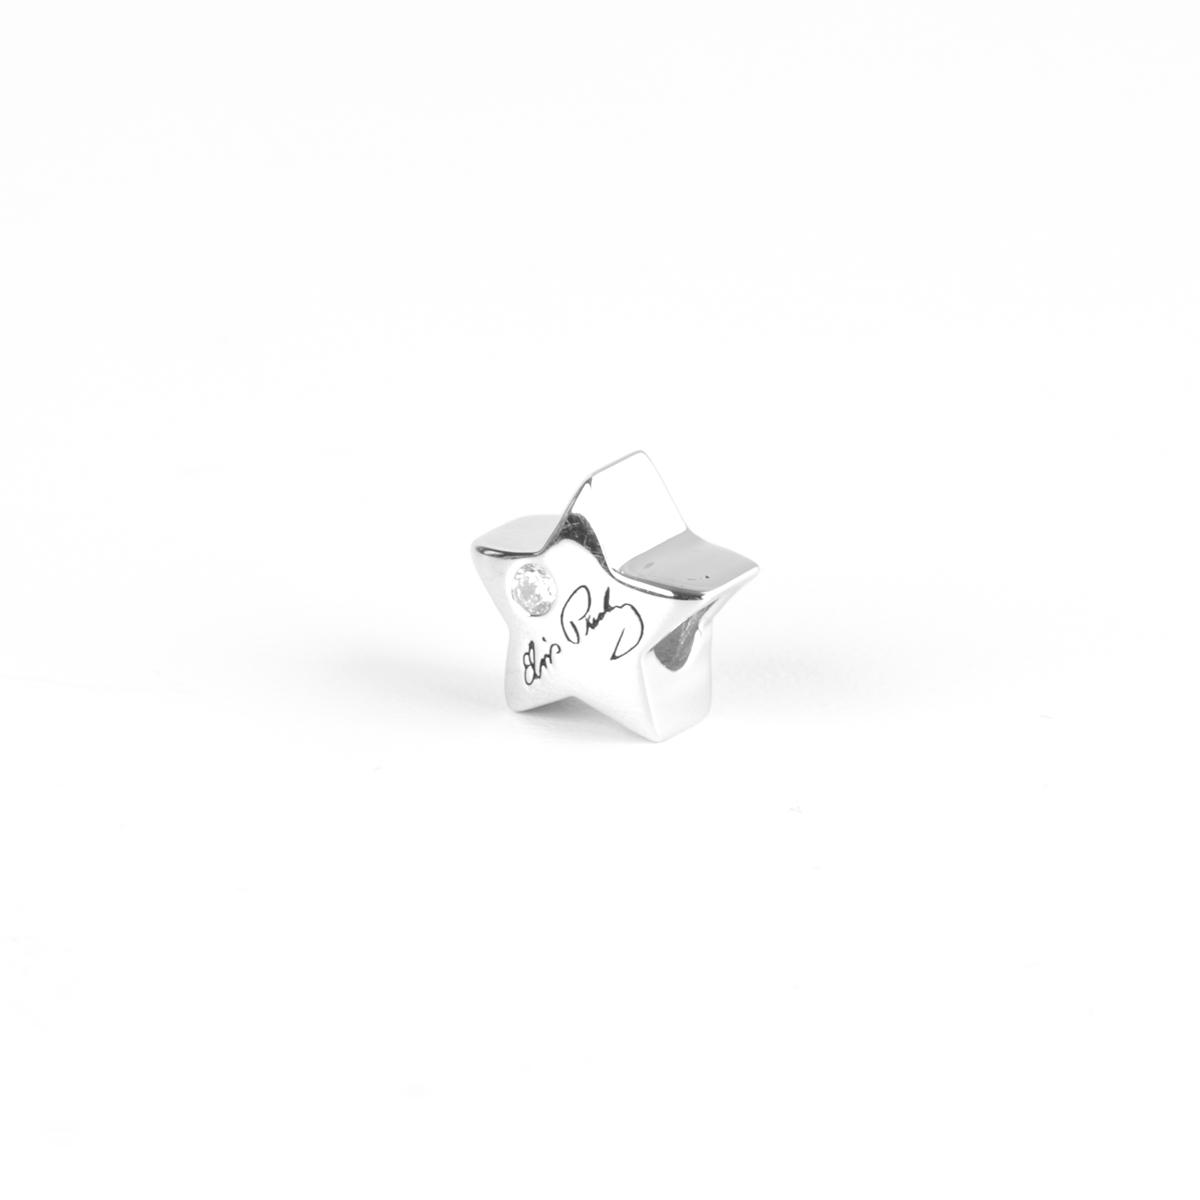 Elvis Silver Charm - Signature Star Bead